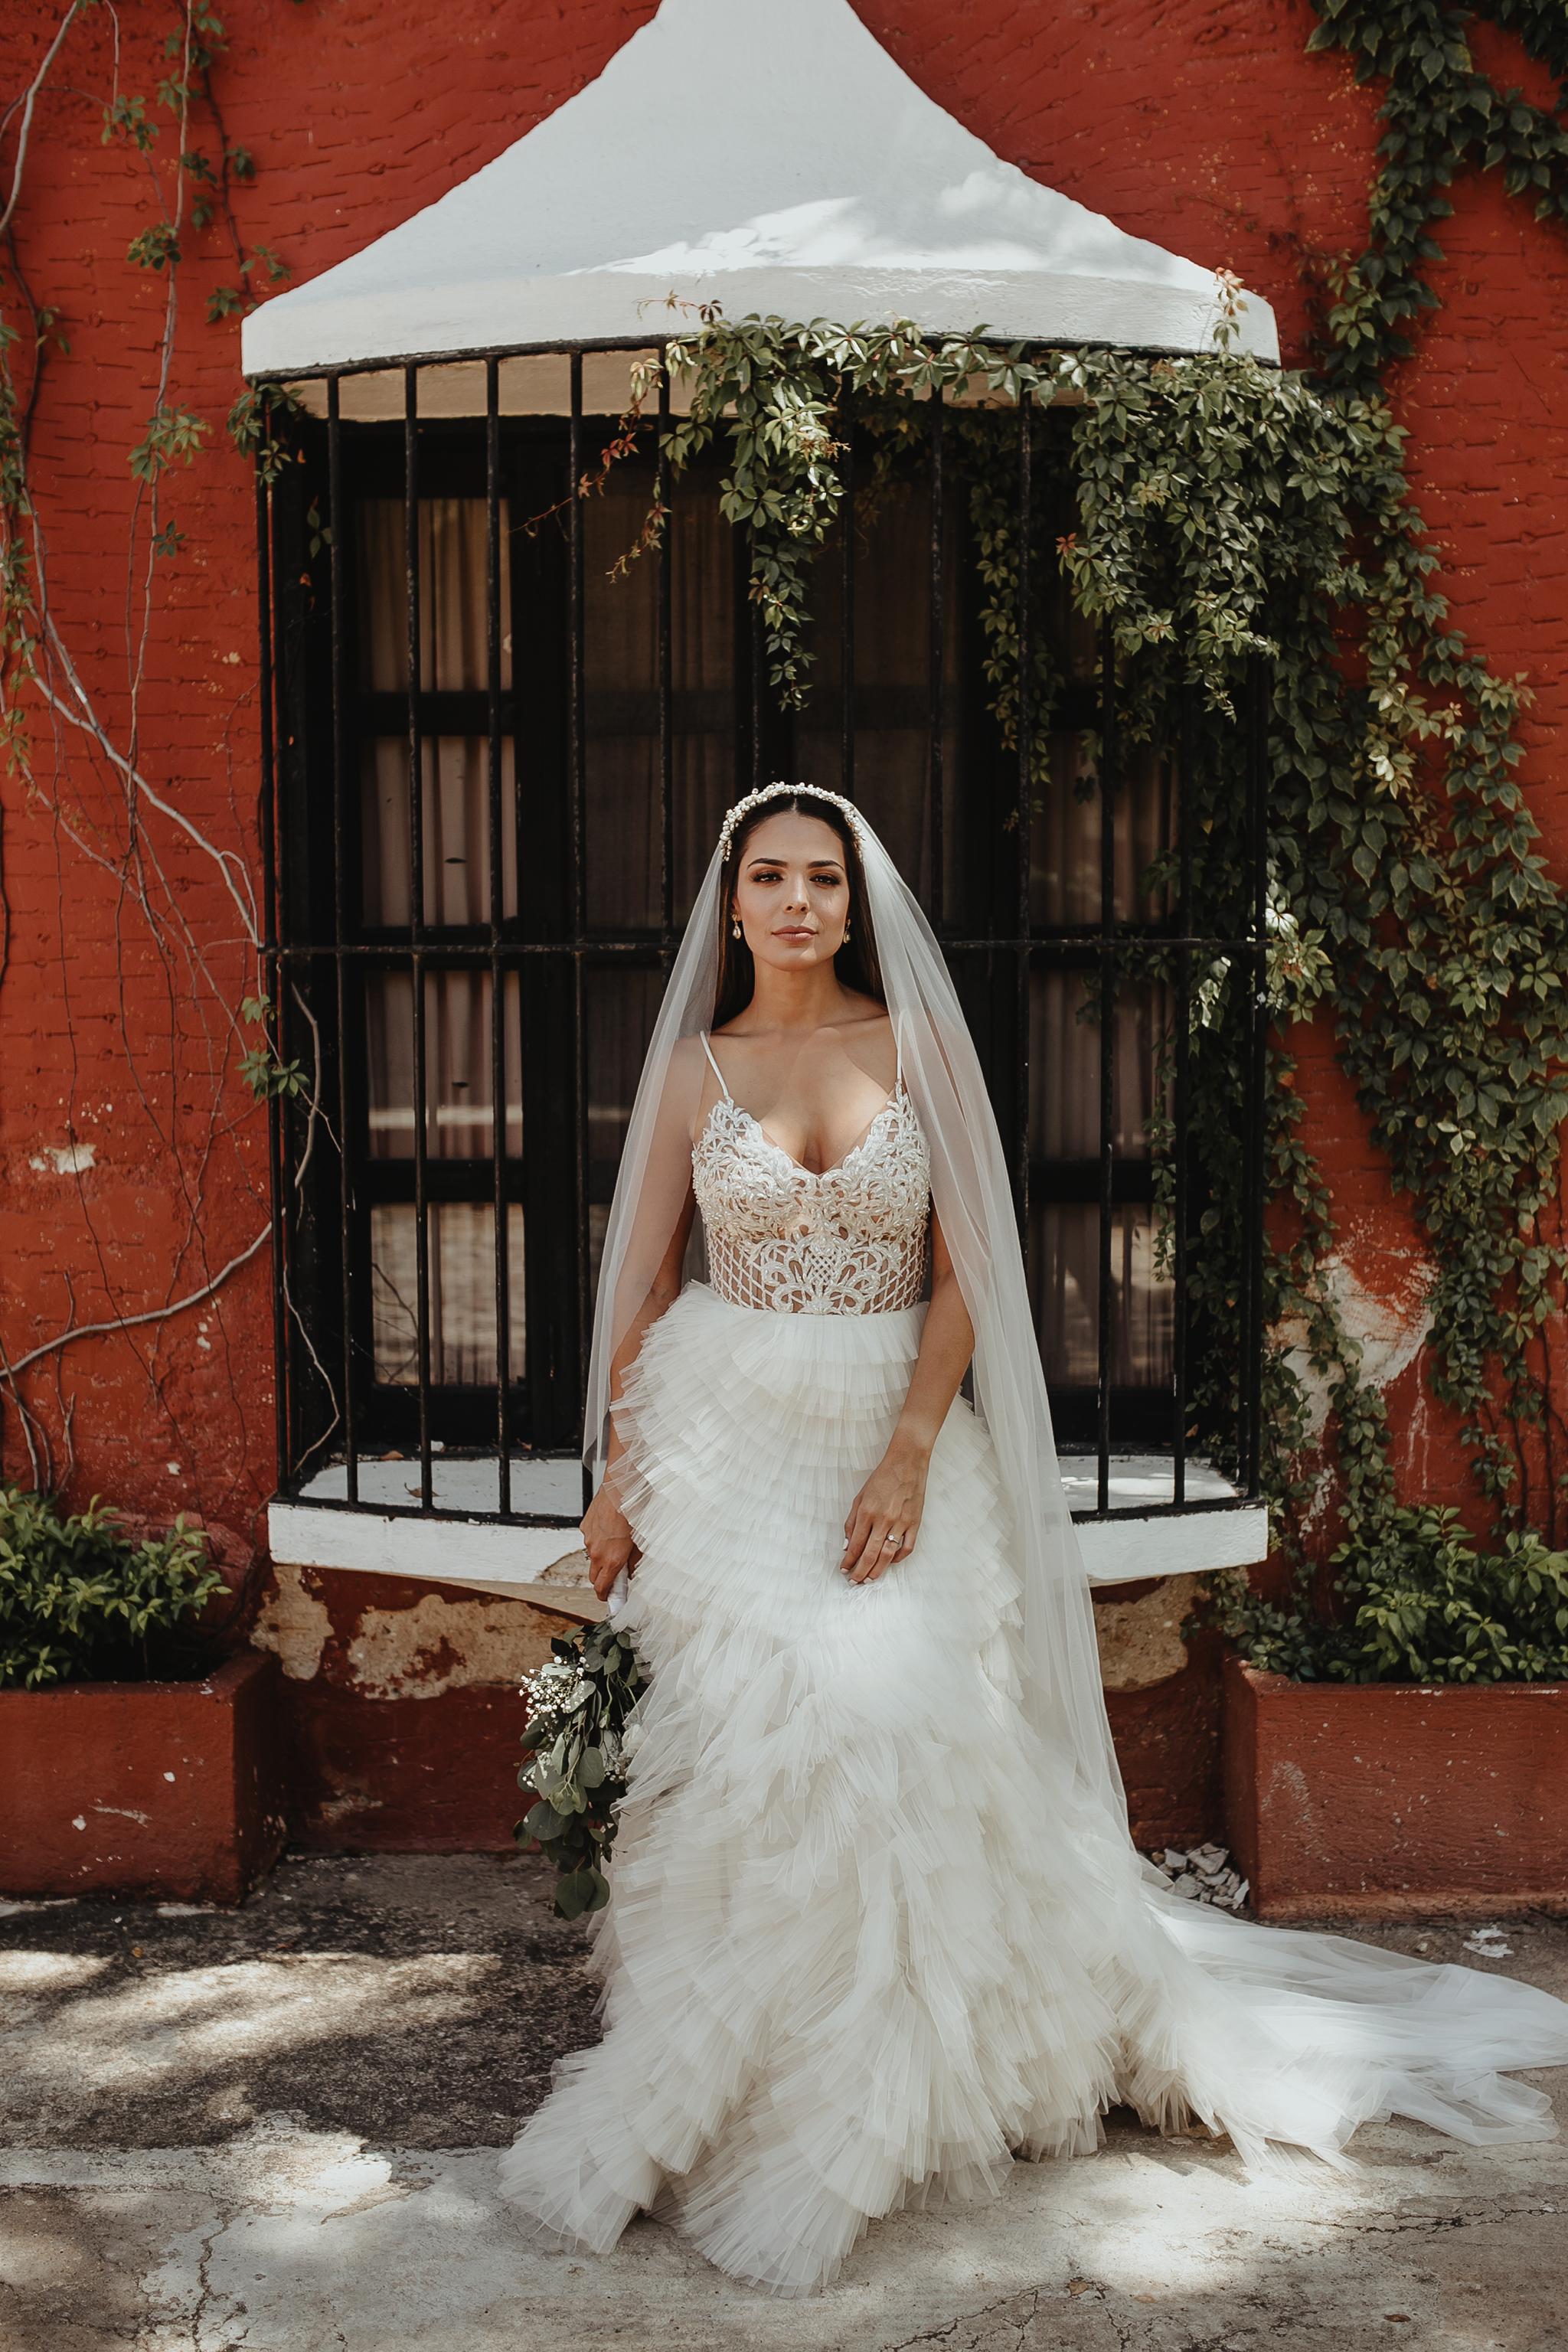 0161R&F__WeddingDestination_Weddingmerida_BodaMexico_FotografoDeBodas_FabrizioSimoneenFotografo.jpg